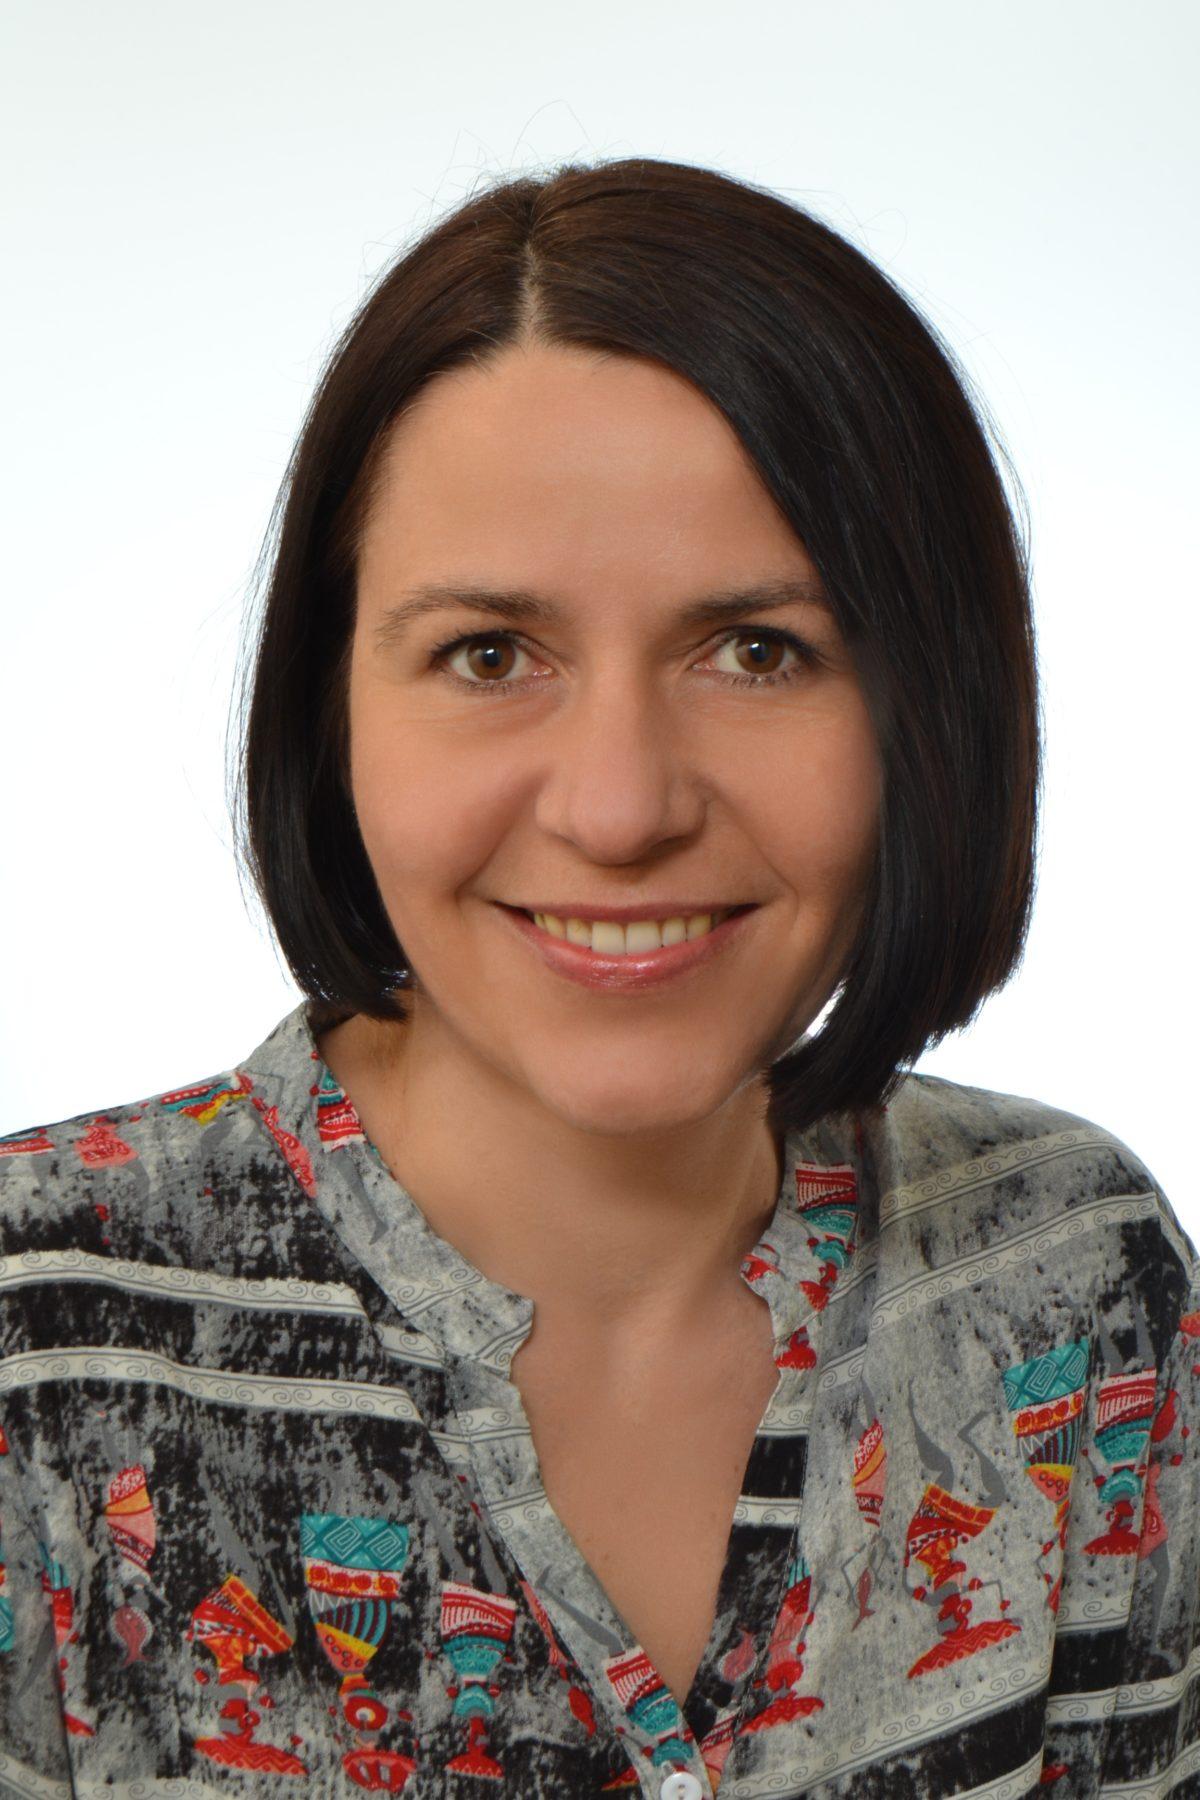 Emilia Den Boer